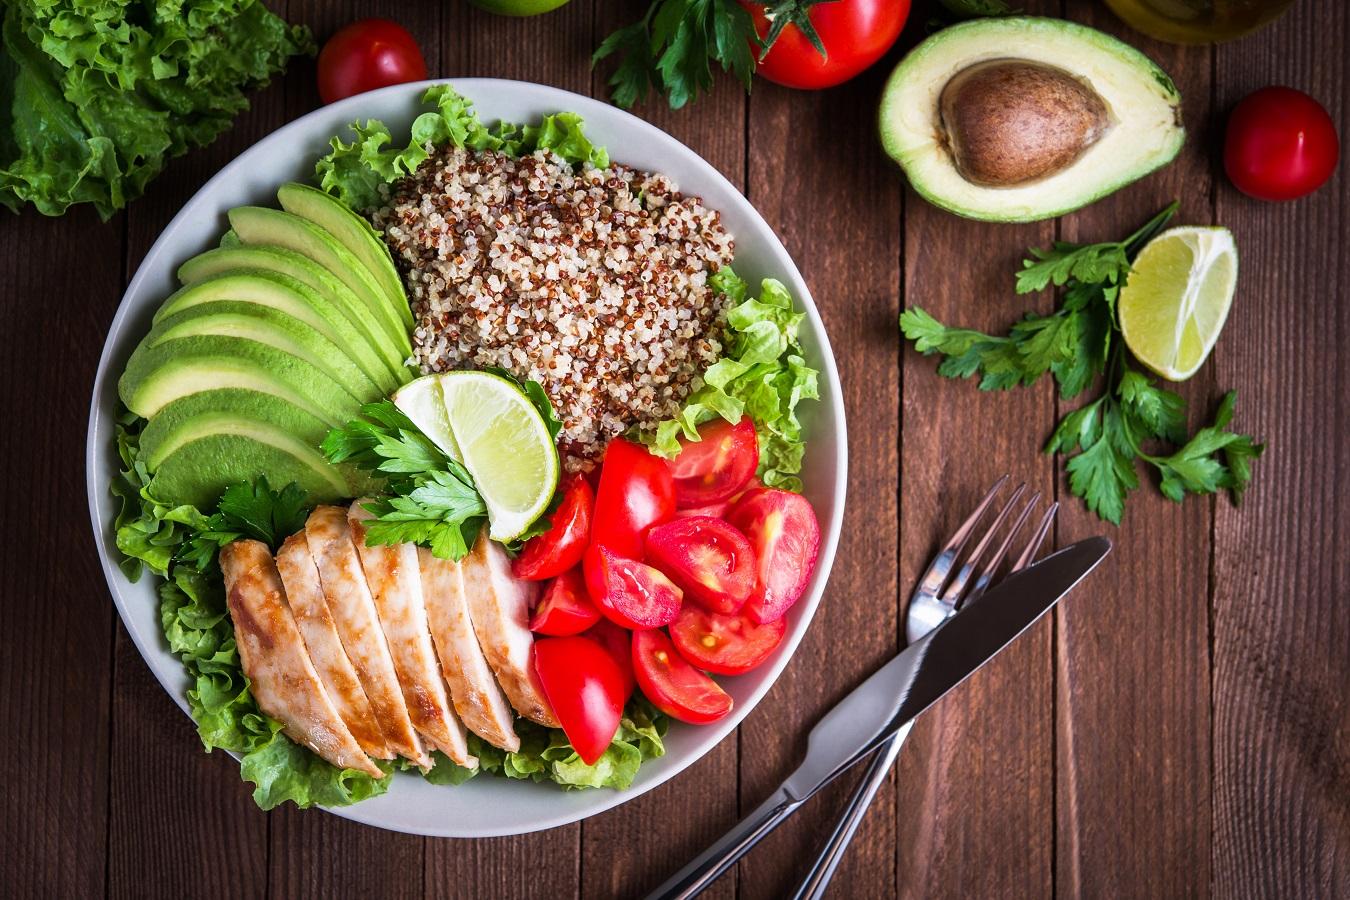 【TGA x 食力】讓外食也能營養! 日本「Smart Meal」認證上路